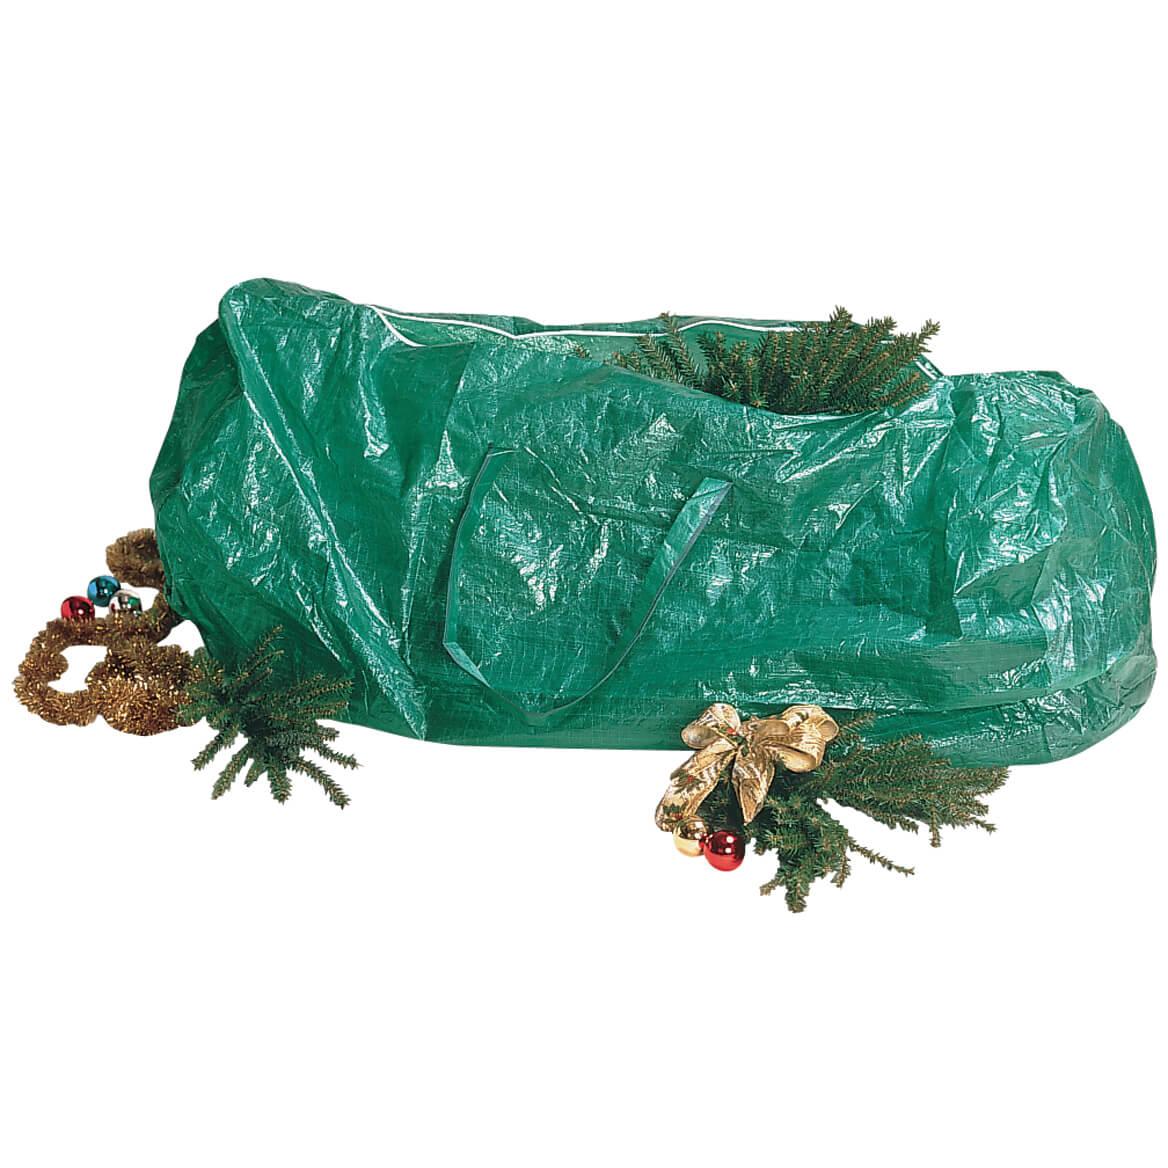 Artificial Tree Storage Bag-311876